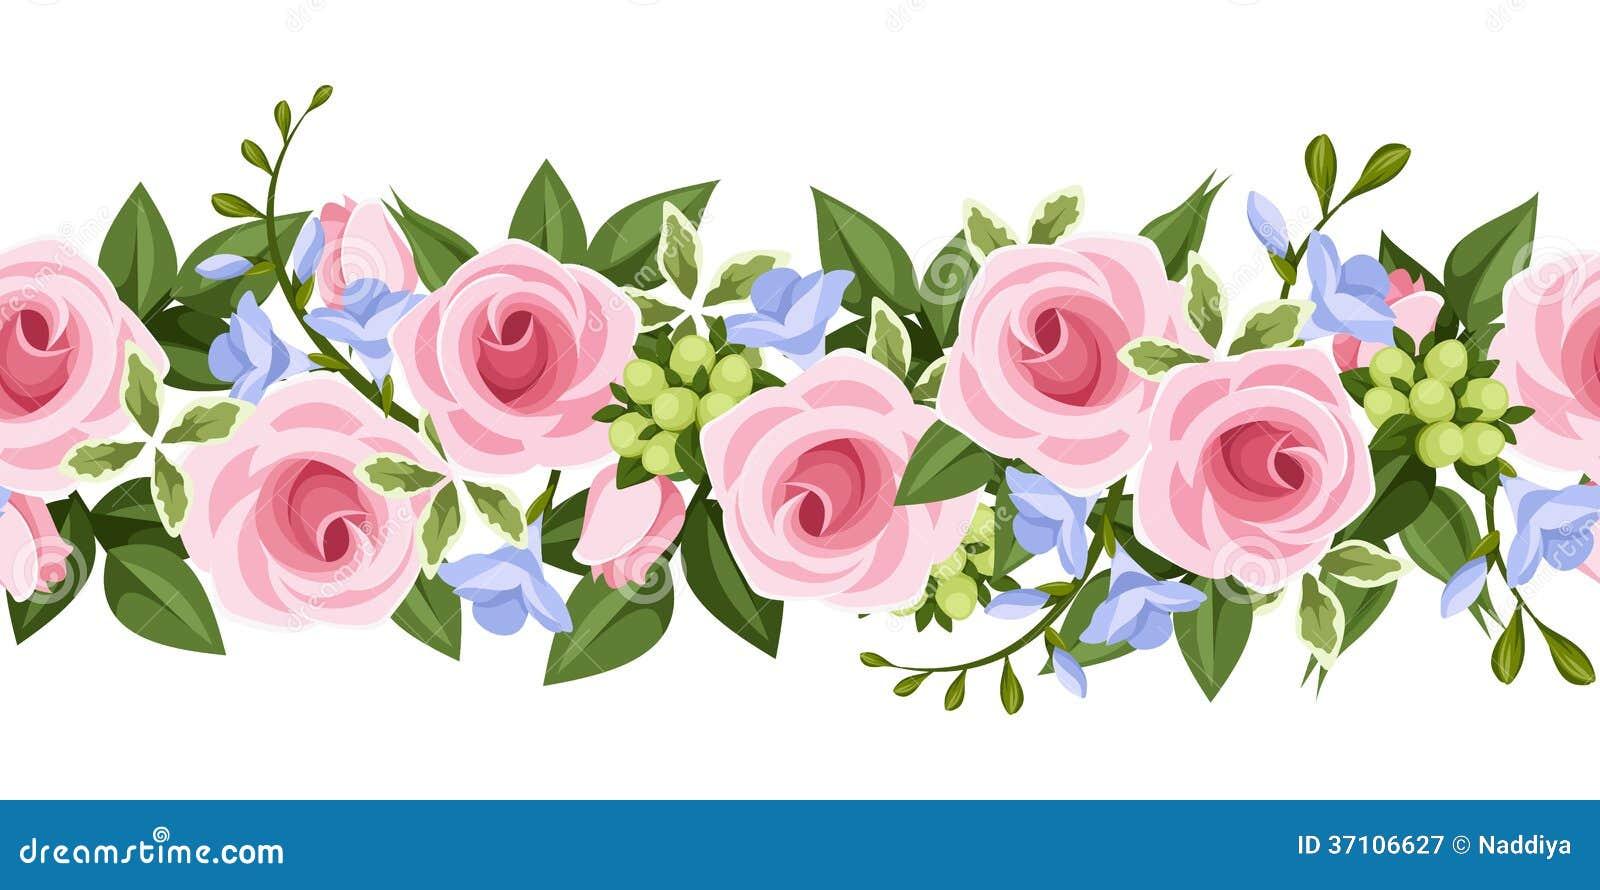 Flores Horizontales Dibujos Animados Patrón De Fondo: Horizontal Seamless Background With Roses And Free Royalty